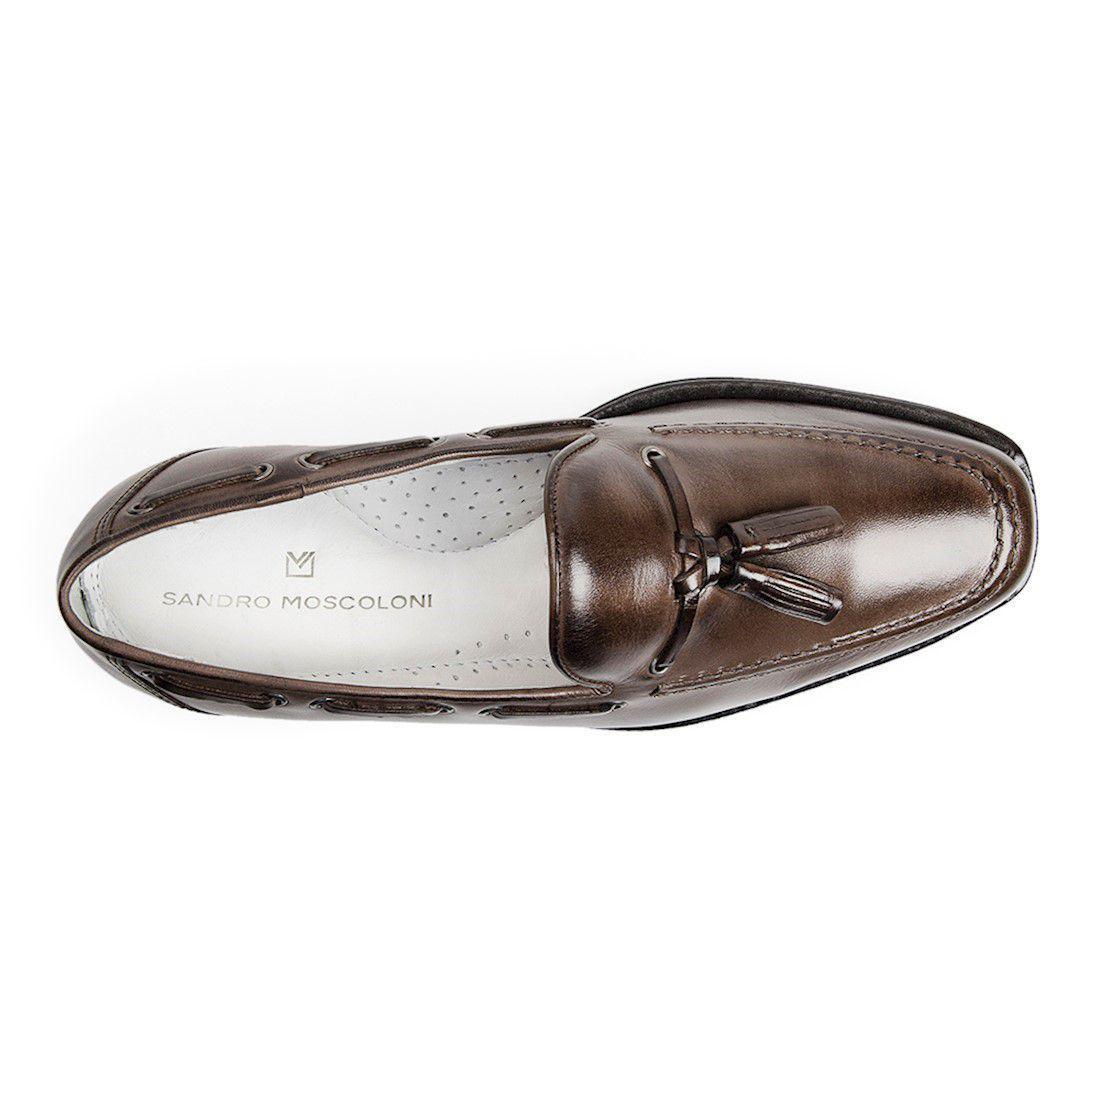 d1c063336 Sapato masculino mocassim sandro moscoloni abraham marrom brown R$ 219,90 à  vista. Adicionar à sacola